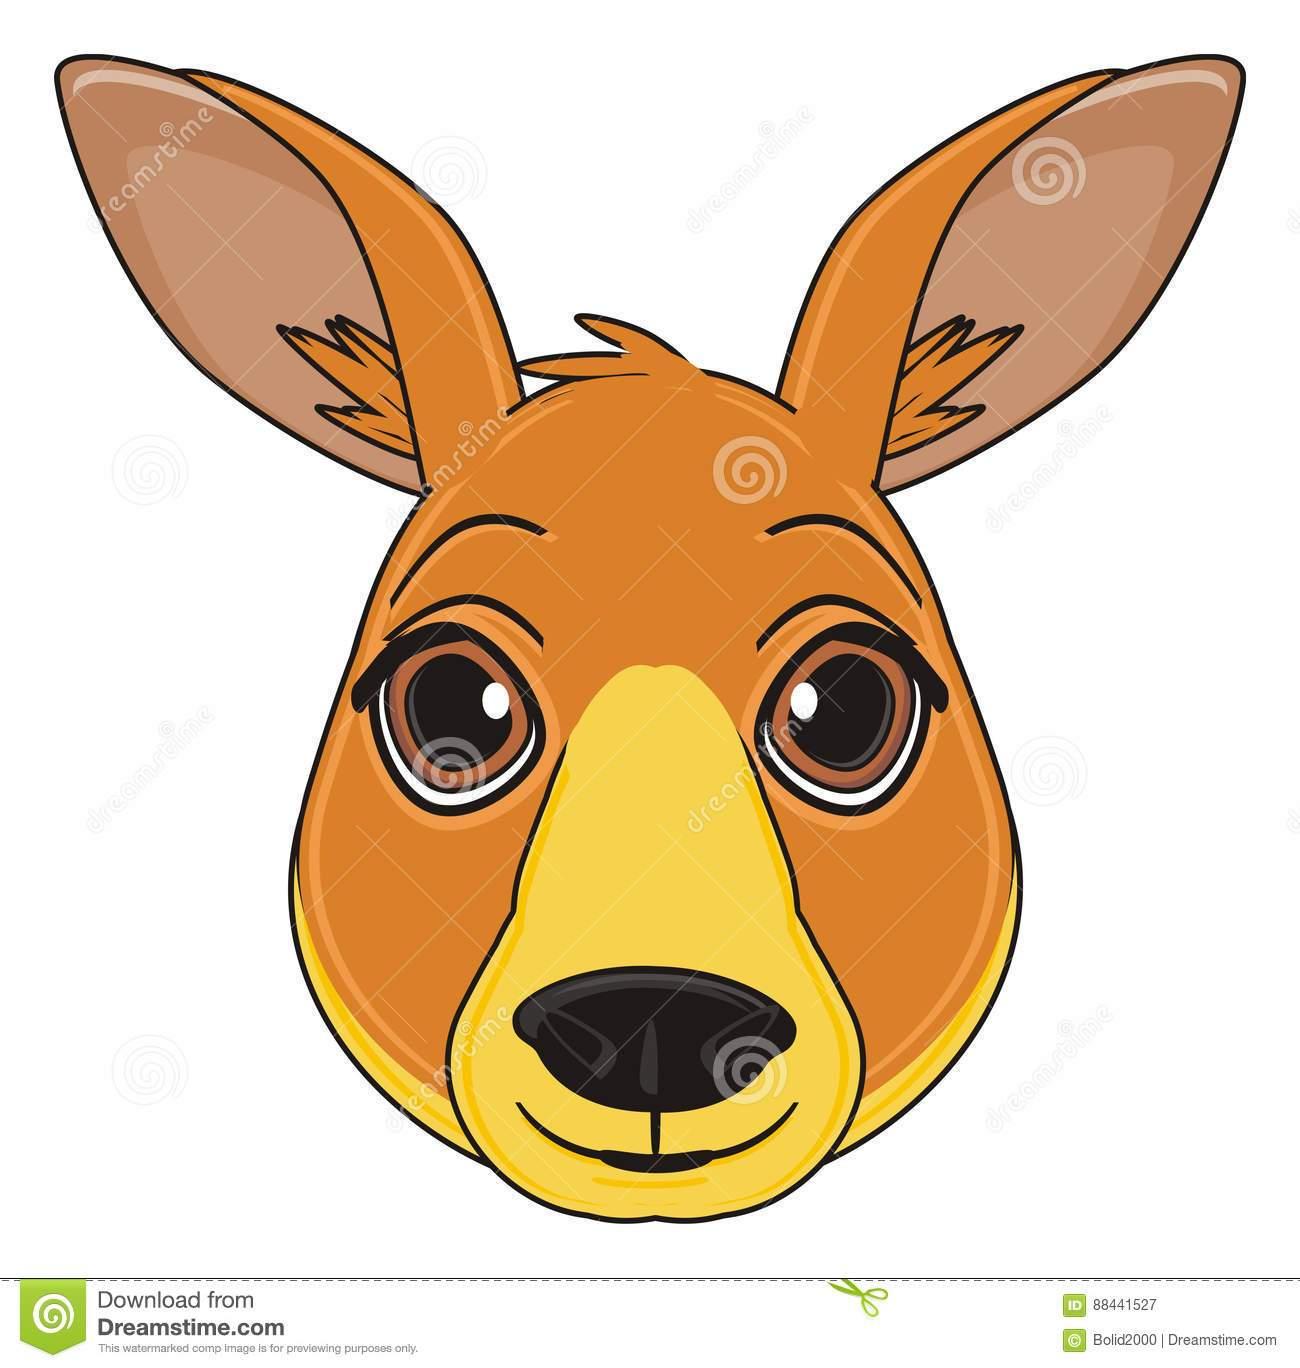 Kangaroo face clipart 1 » Clipart Portal.